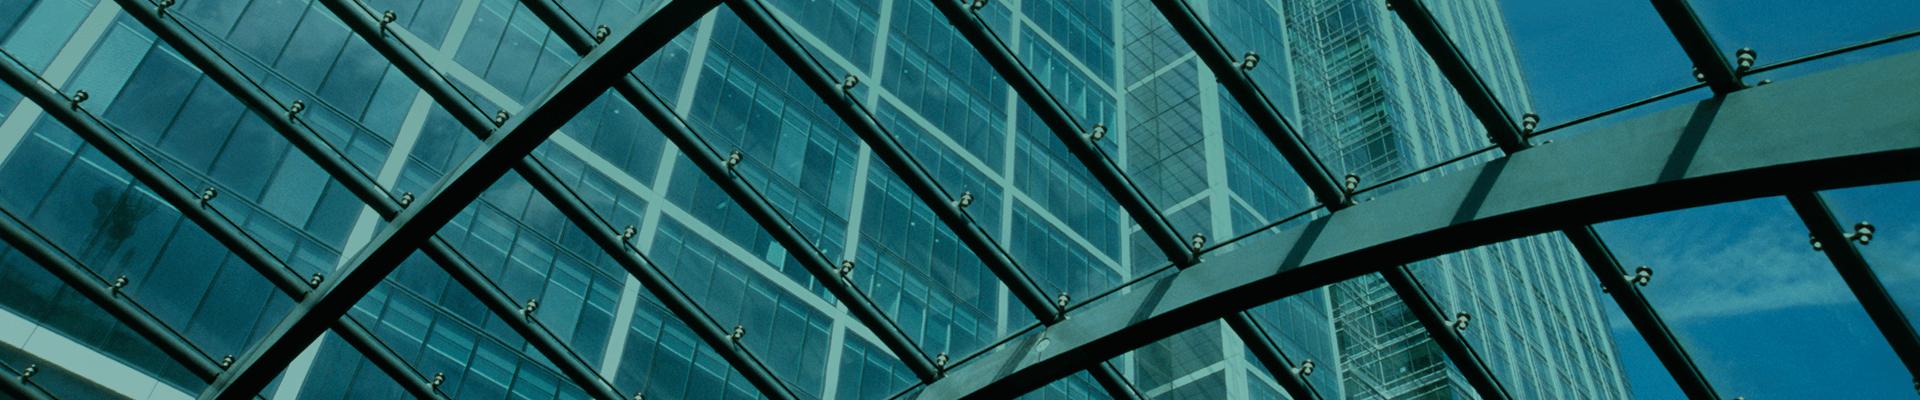 slider-simples-teto-de-vidro-2-vidrovalle-byMairaDamasio-midiazaz